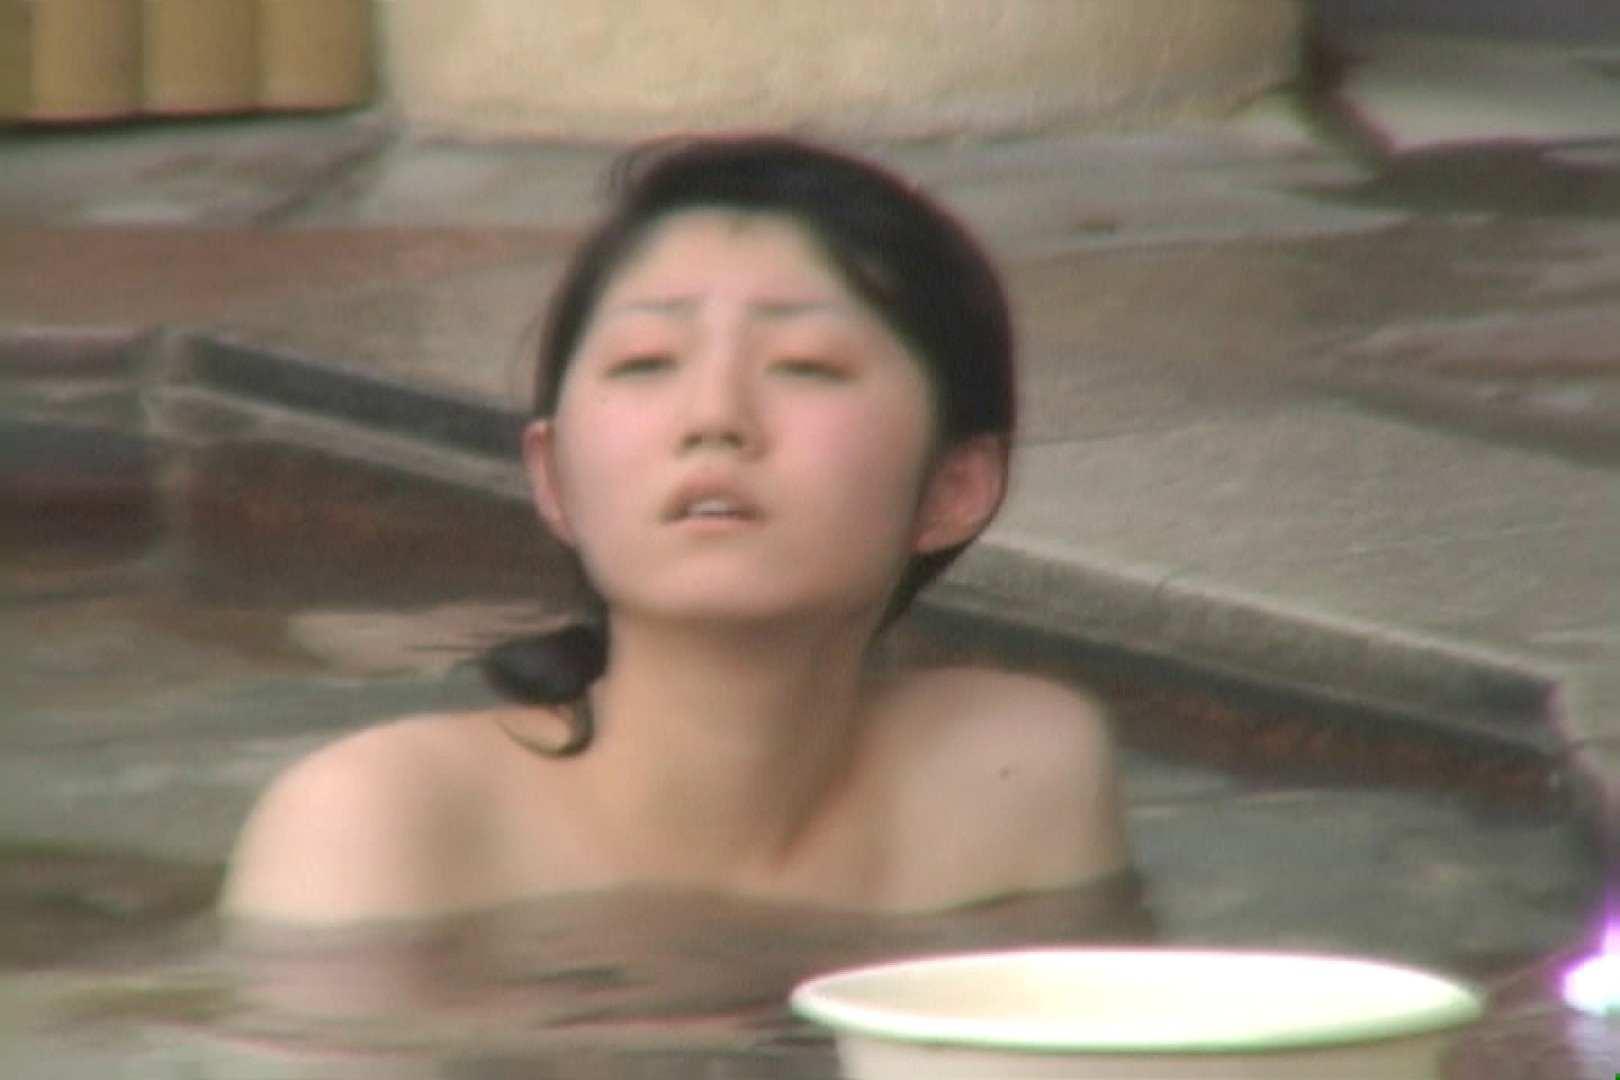 Aquaな露天風呂Vol.579 露天   OLセックス  52画像 28